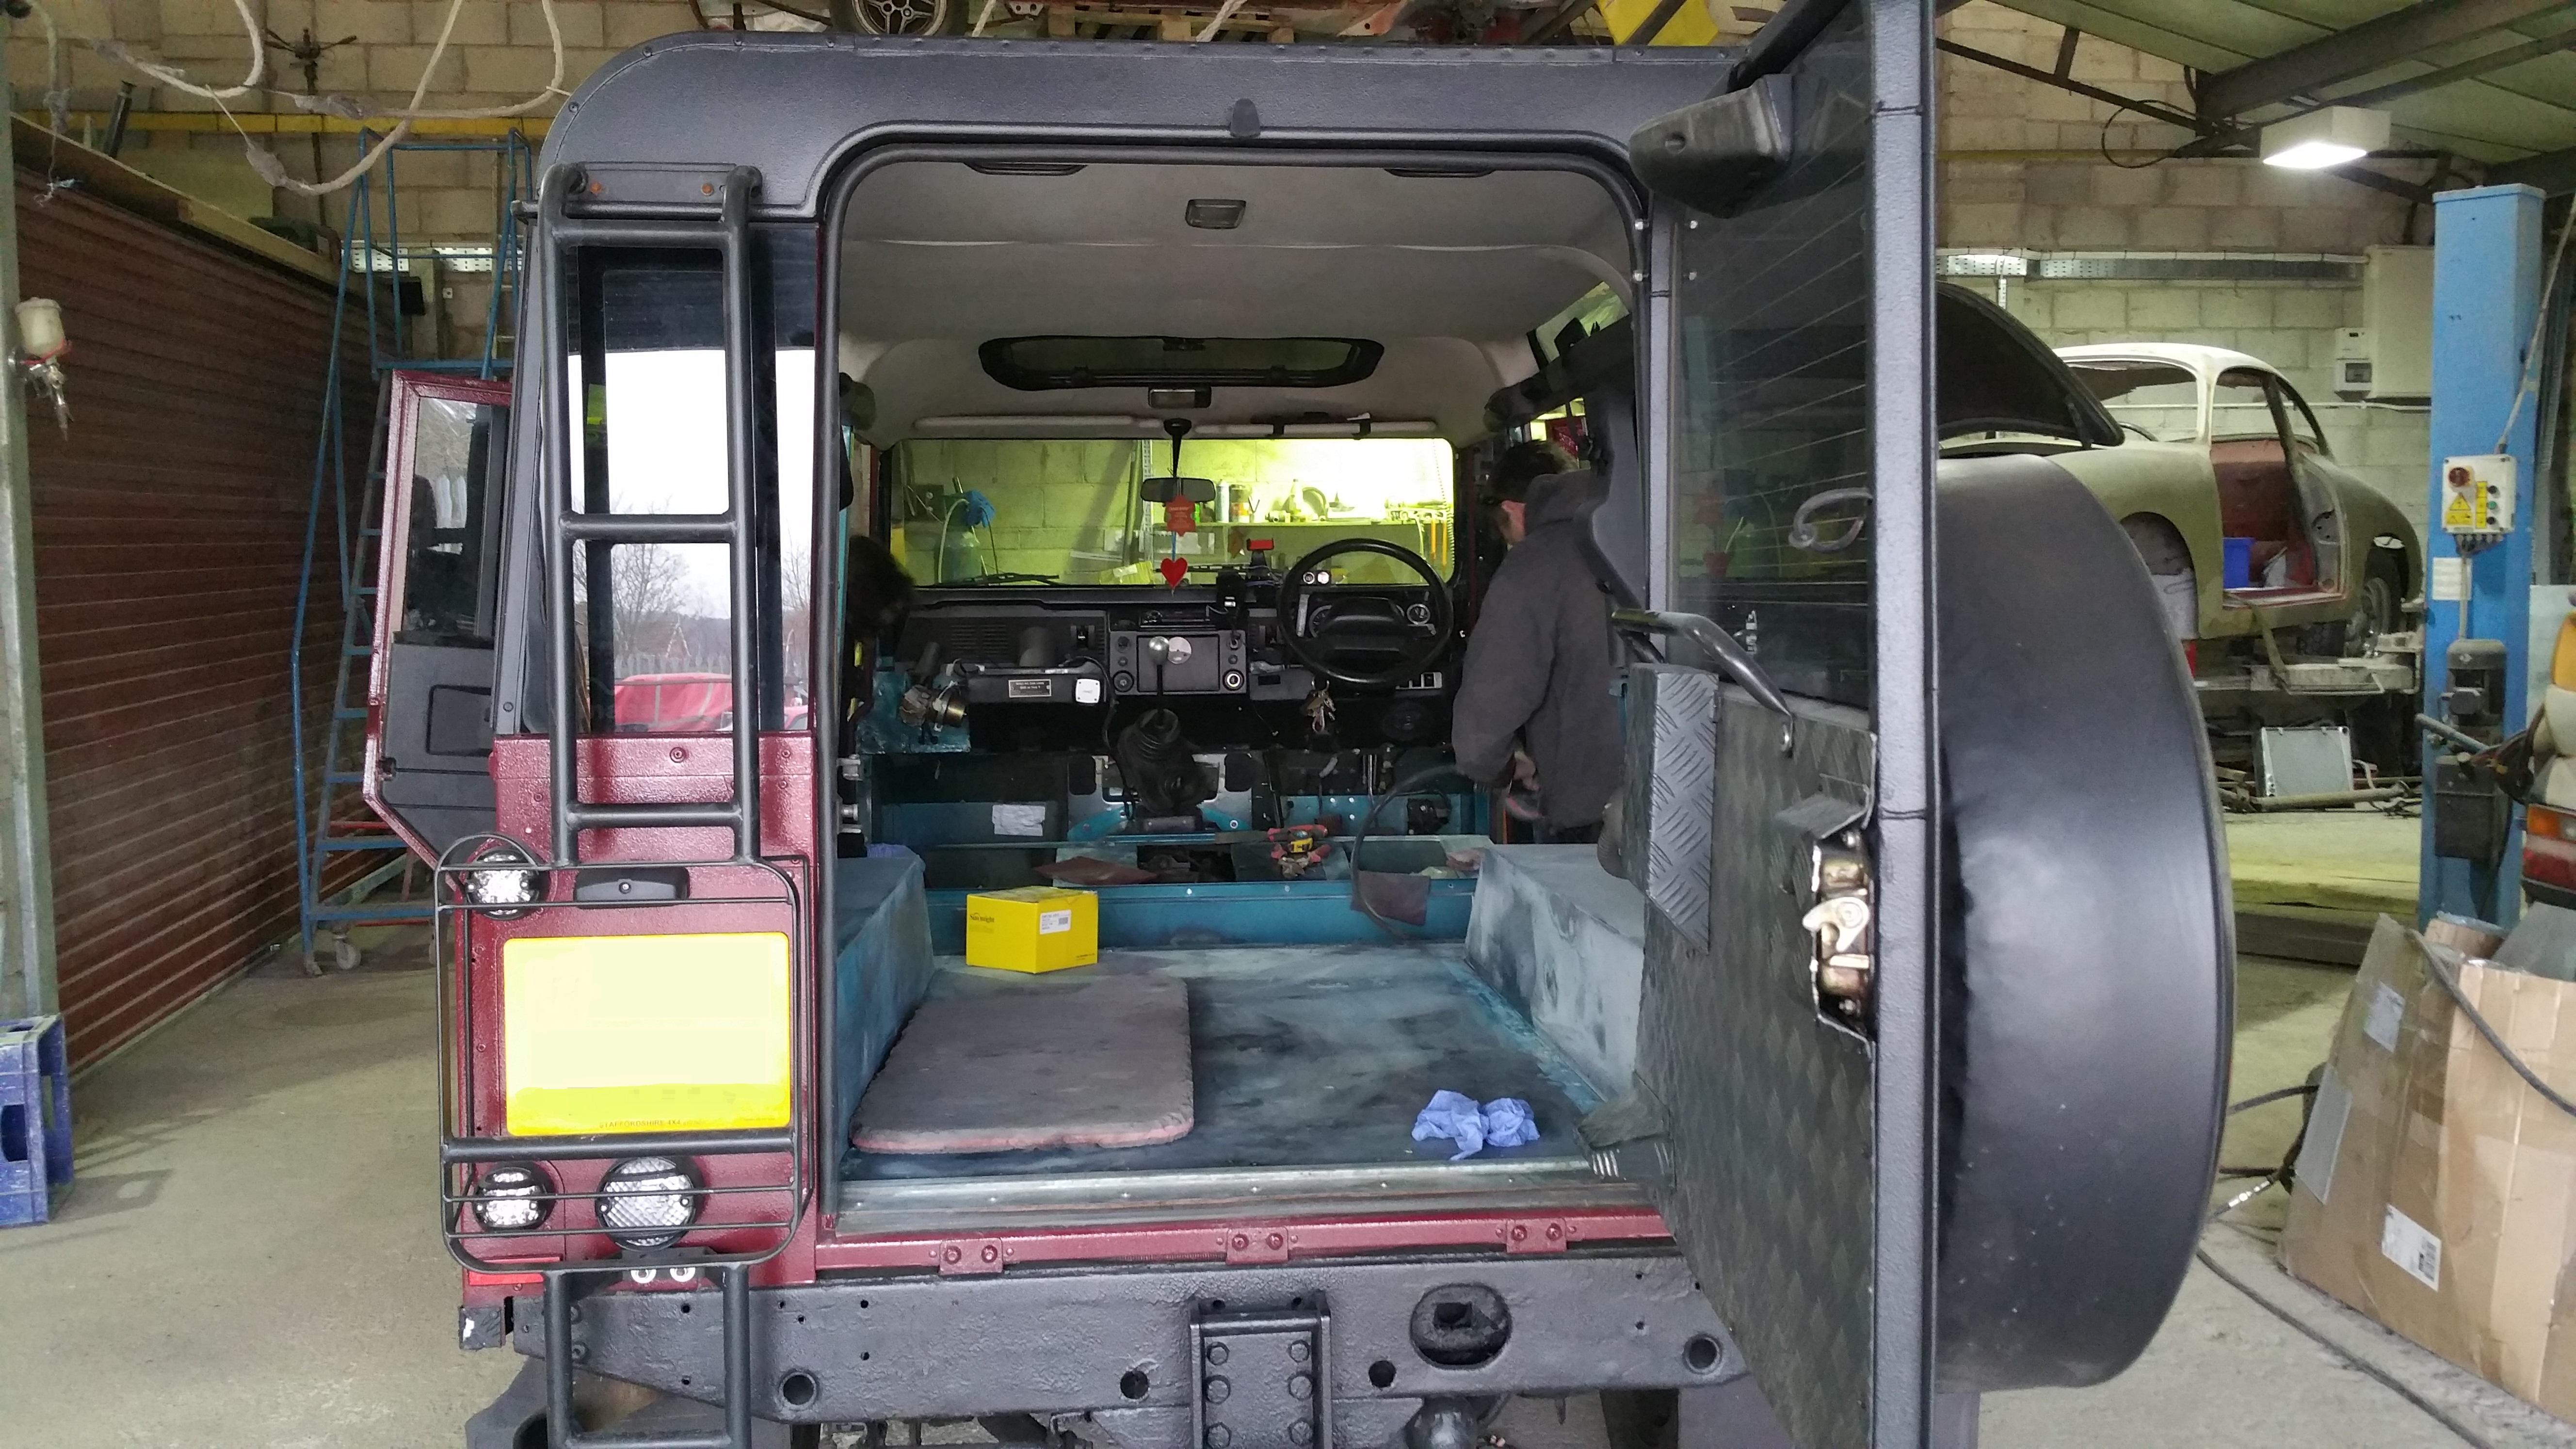 Defender 110 Work in progress | Land Rover Specialists